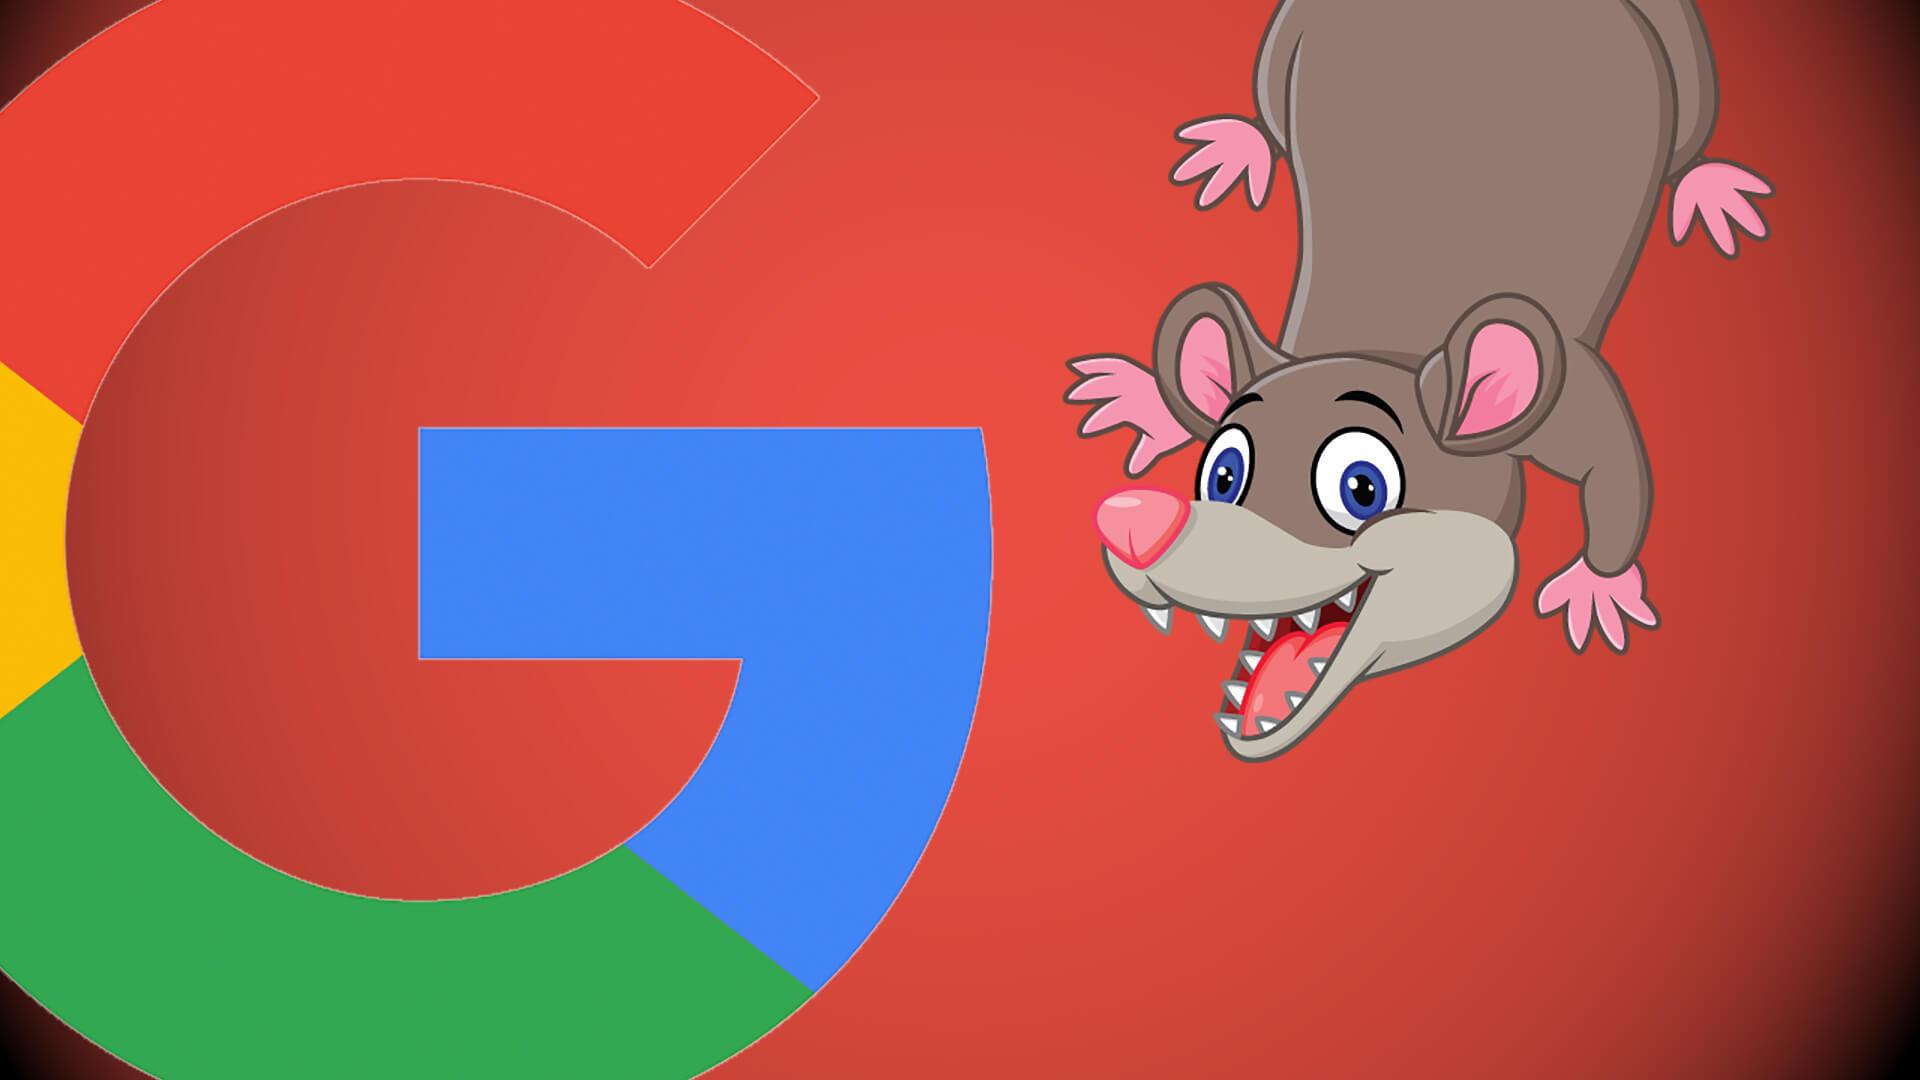 Thuật toán tìm kiếm Possum